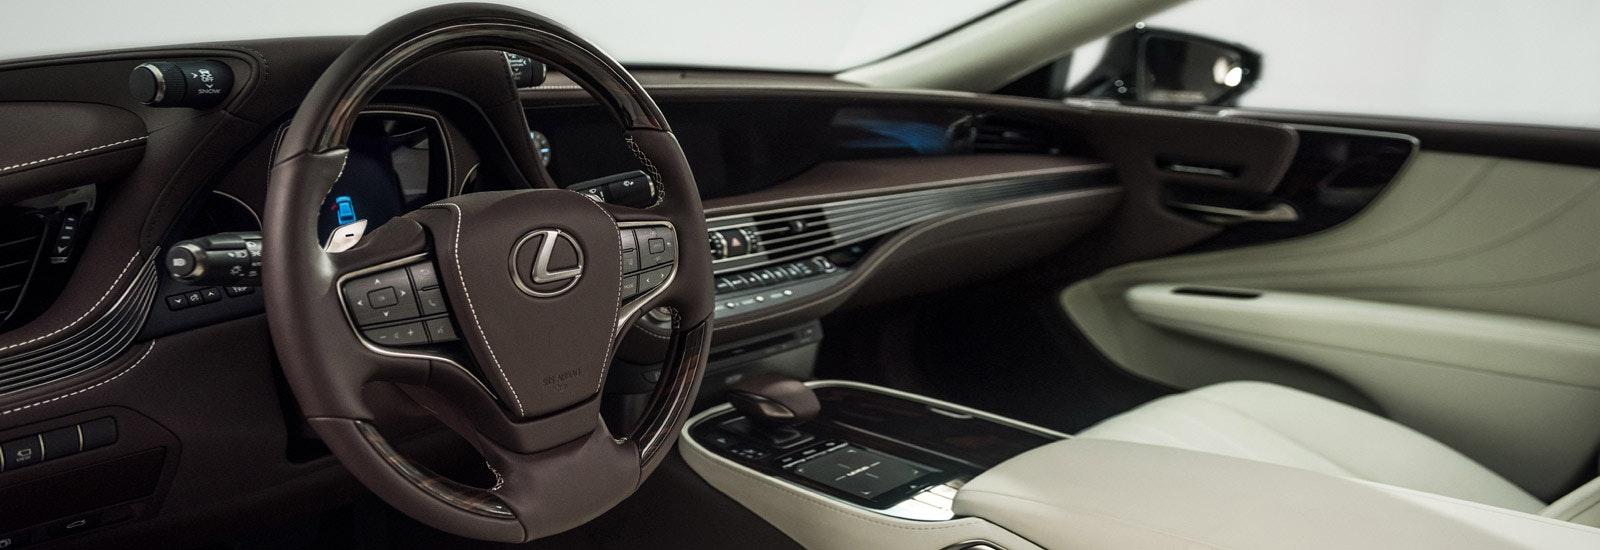 2018 Lexus LS500: price, specs, release date | carwow